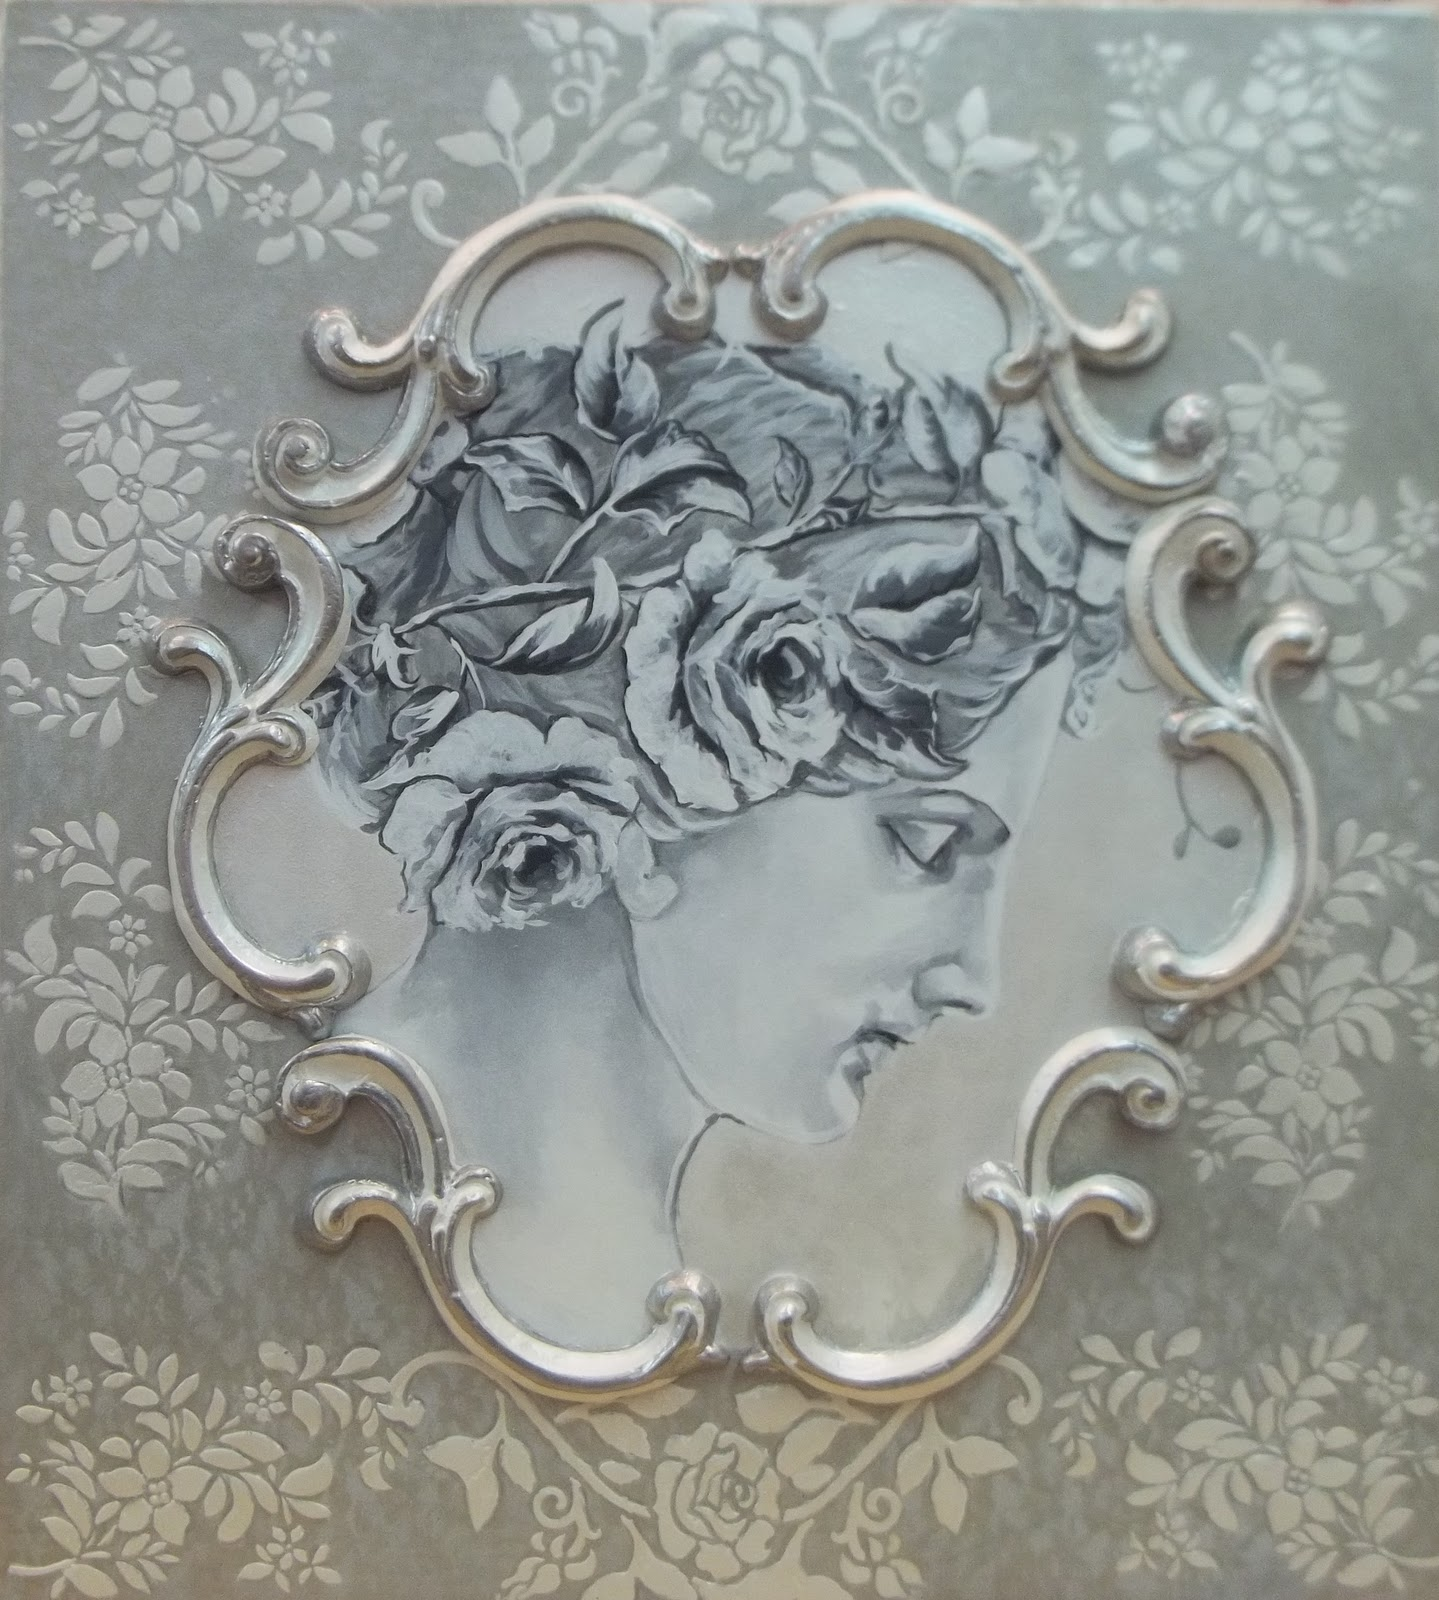 French rococo art